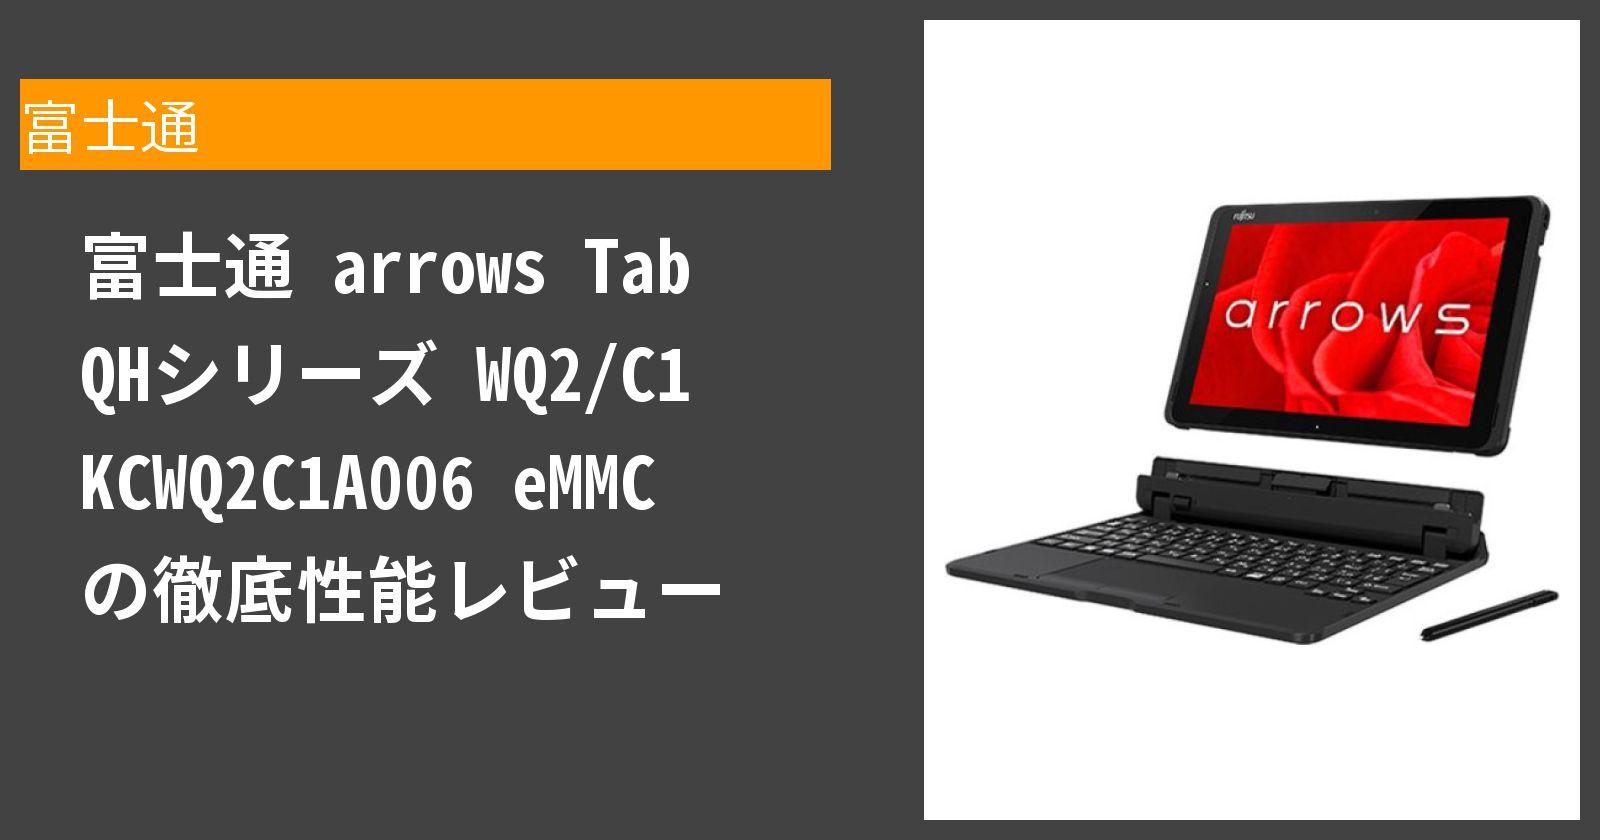 arrows Tab QHシリーズ WQ2/C1 KCWQ2C1A006 eMMC の徹底性能レビュー